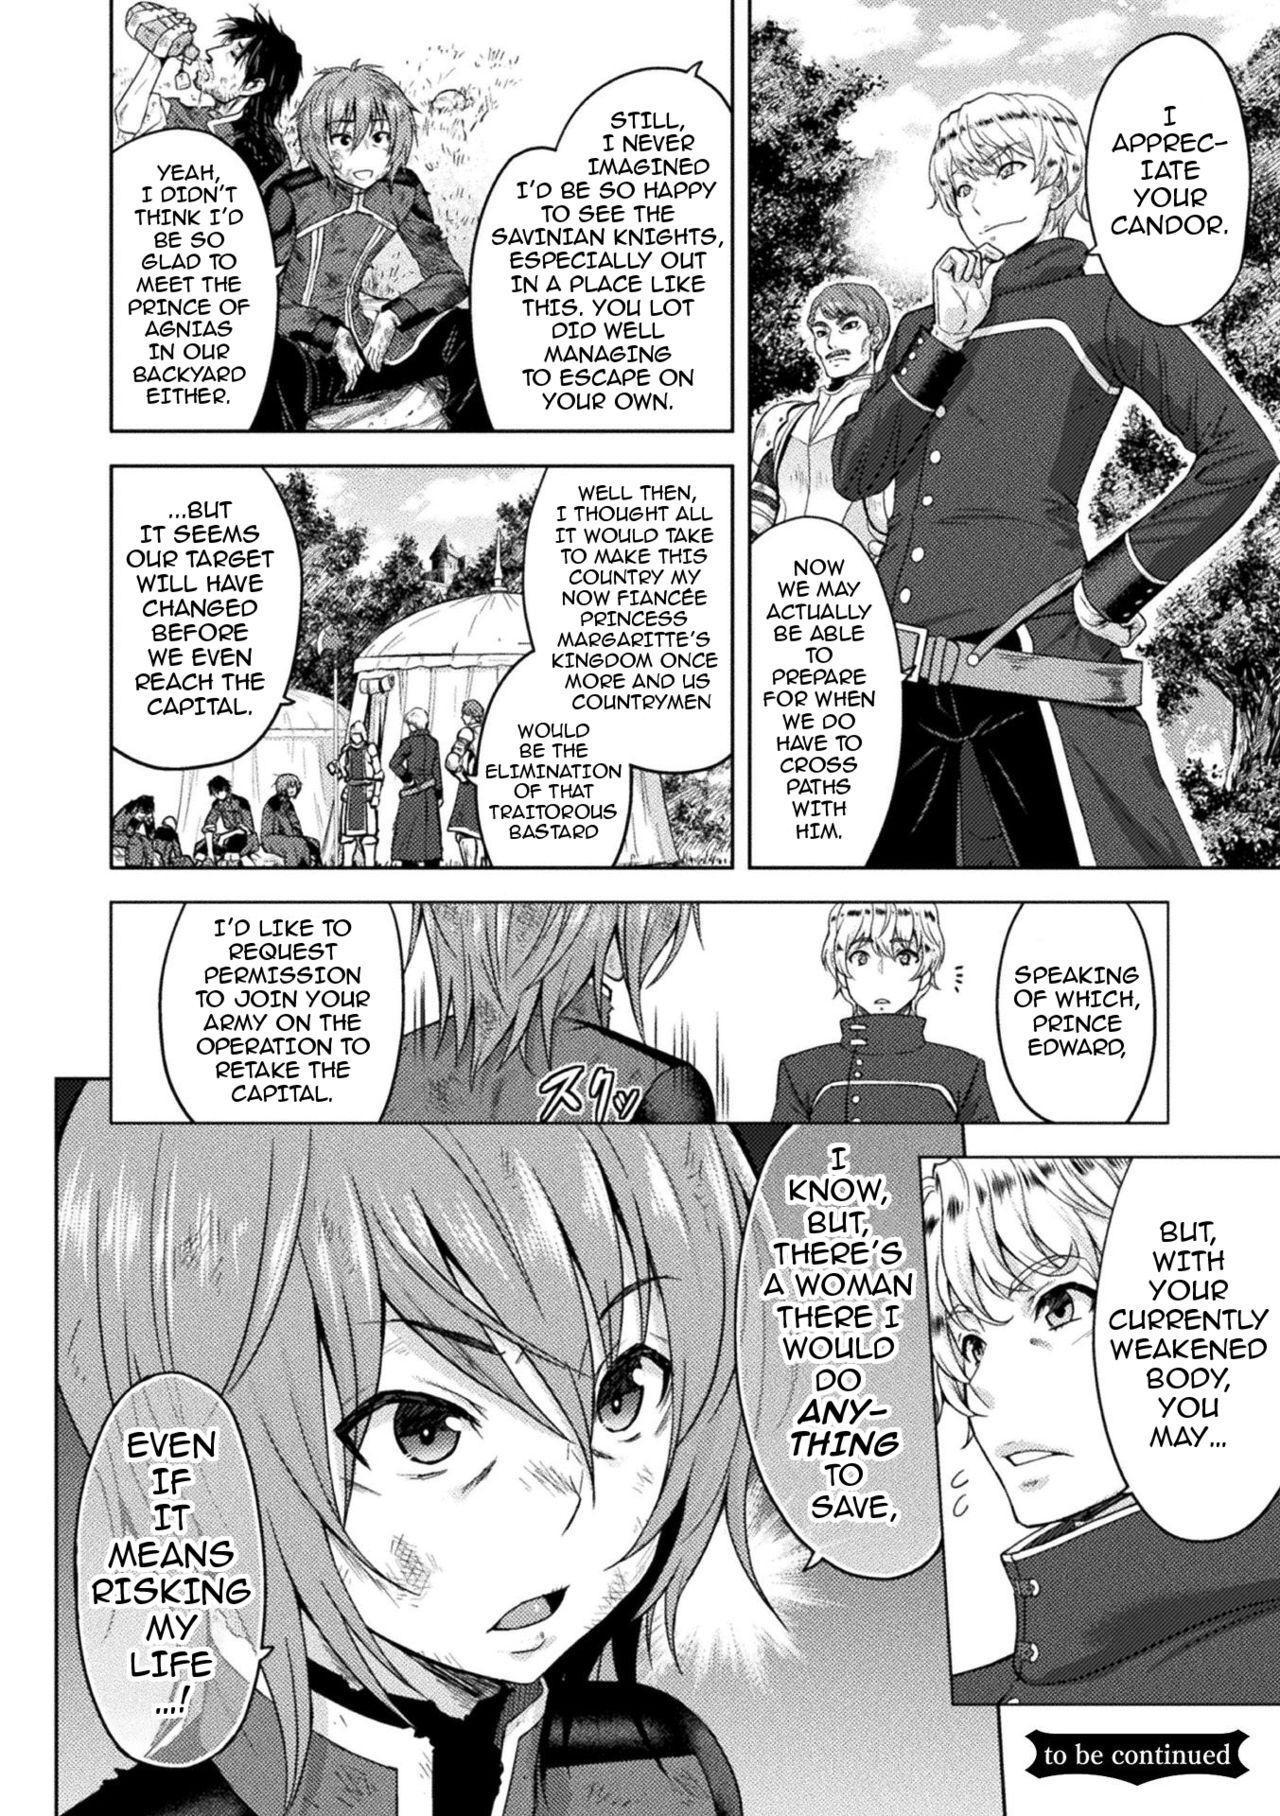 [Yamada Gogogo] Erona ~Orc no Inmon ni Okasareta Onna Kishi no Matsuro~ | Erona ~The Fall of a Beautiful Knight Cursed with the Lewd Mark of an Orc~ Ch. 1-6 [English] [darknight] [Decensored] [ongoing] 99